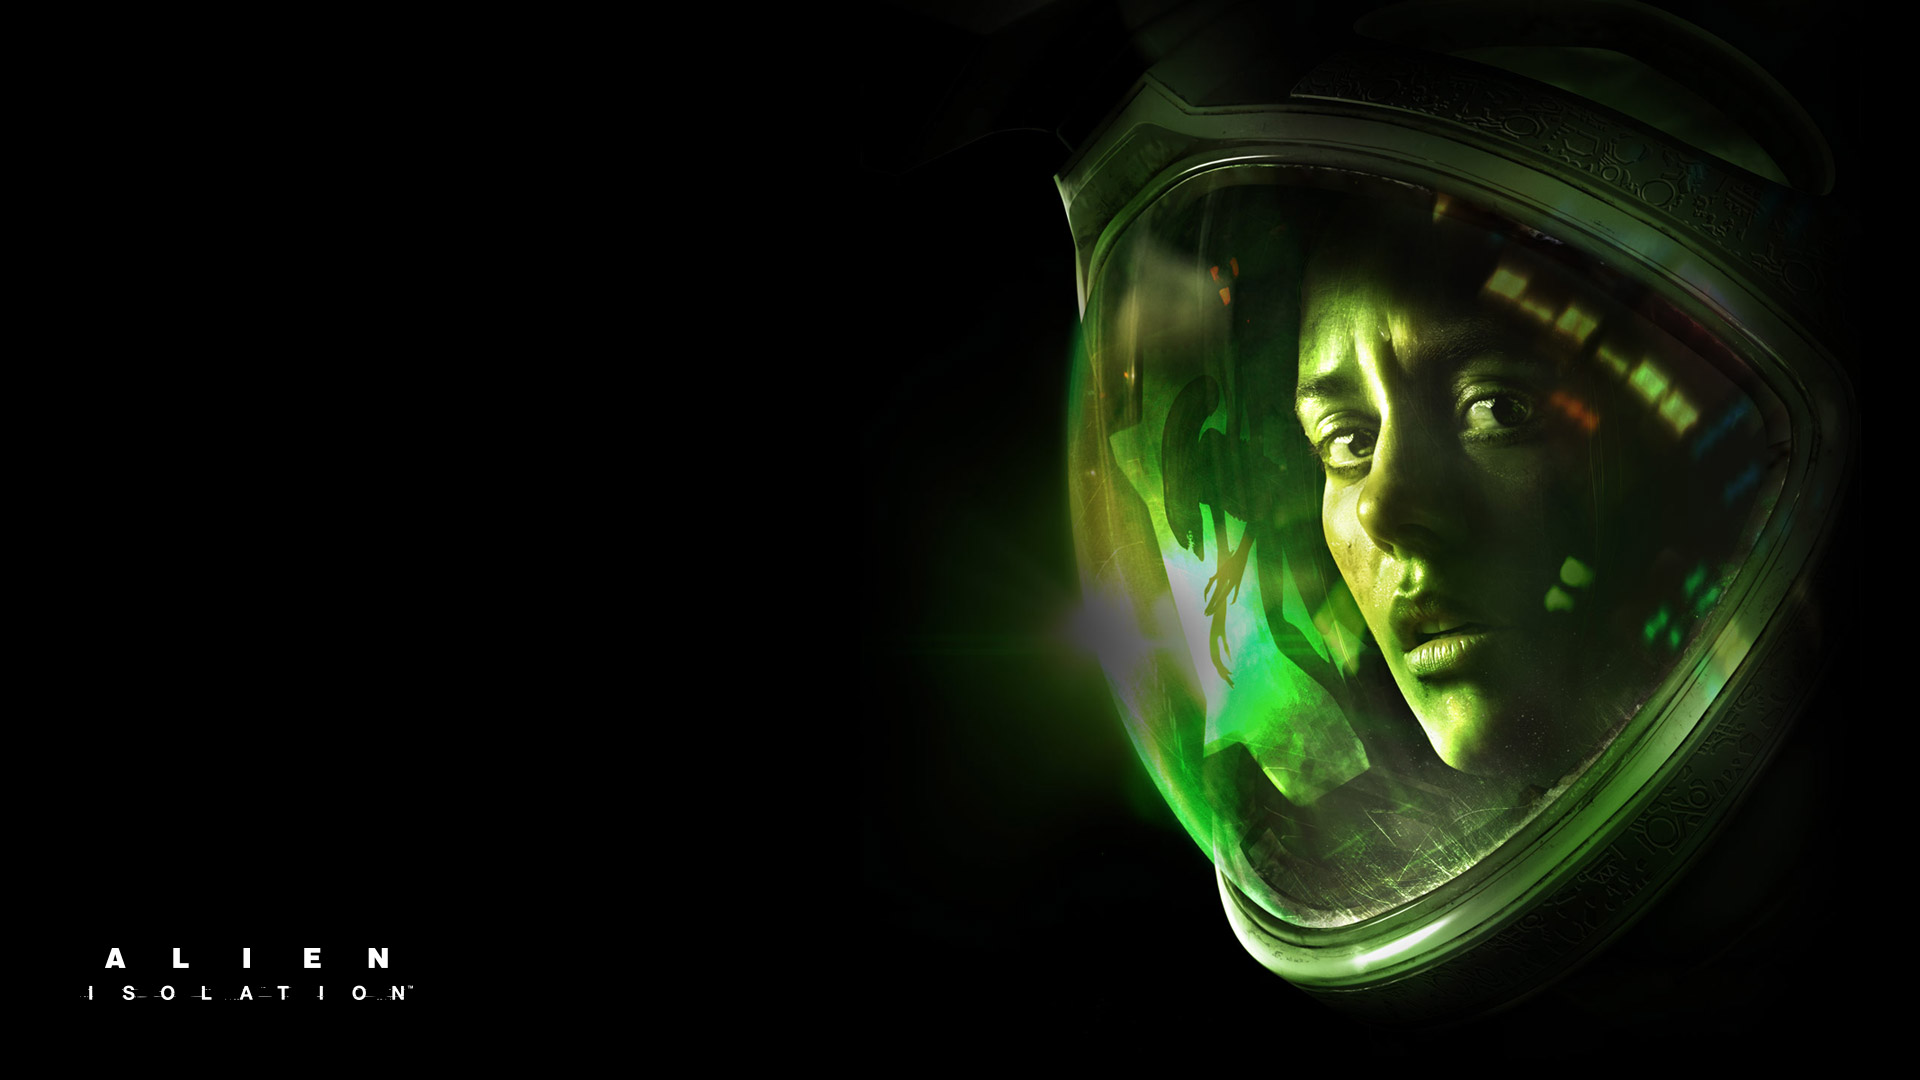 Free Download Alien Isolation Jeux Video Fond Ecran